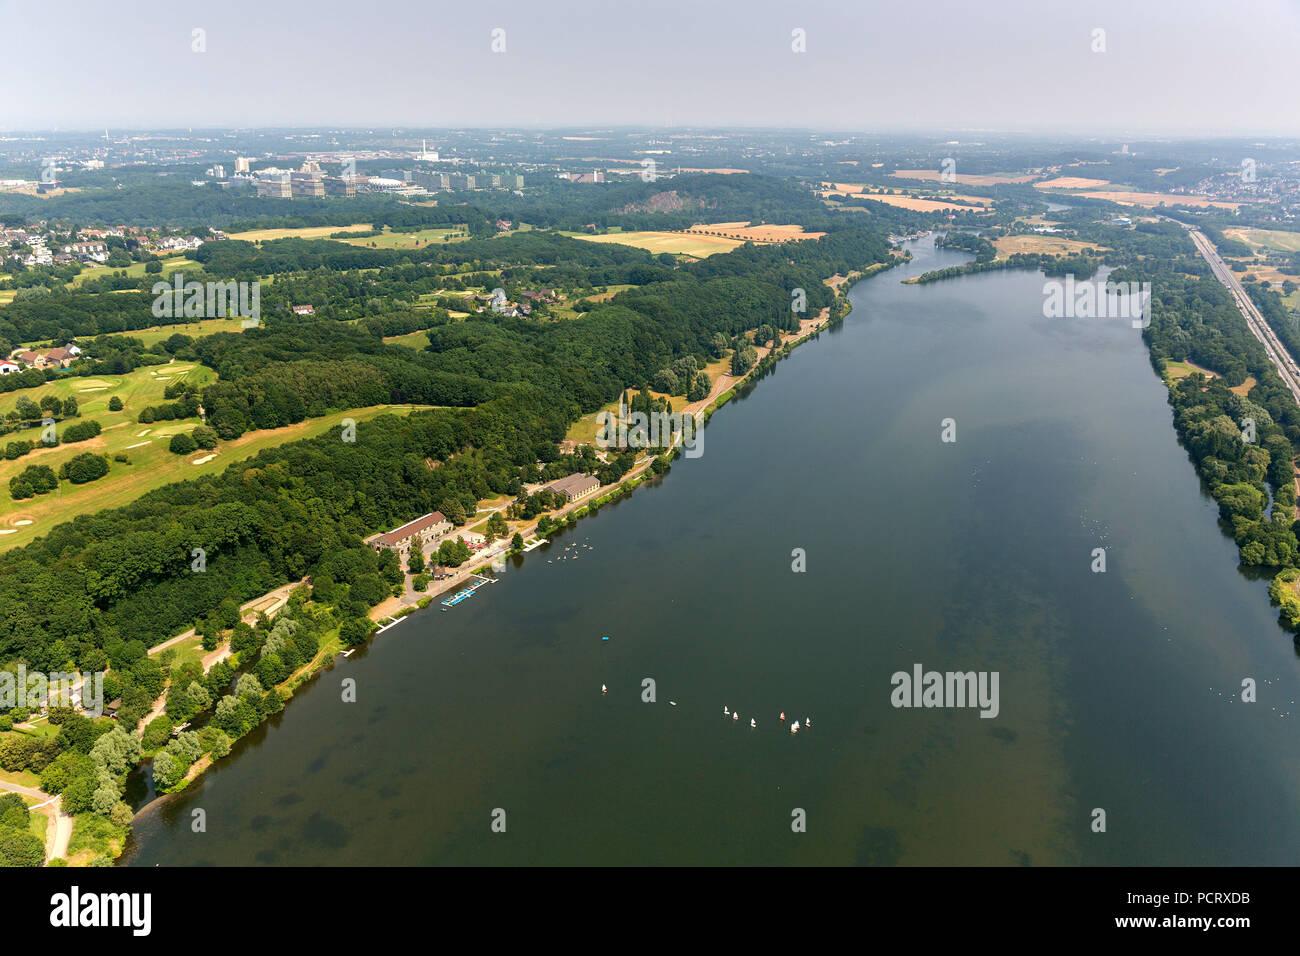 Kemnade, Kemnader reservoir, aerial view of Bochum - Stock Image